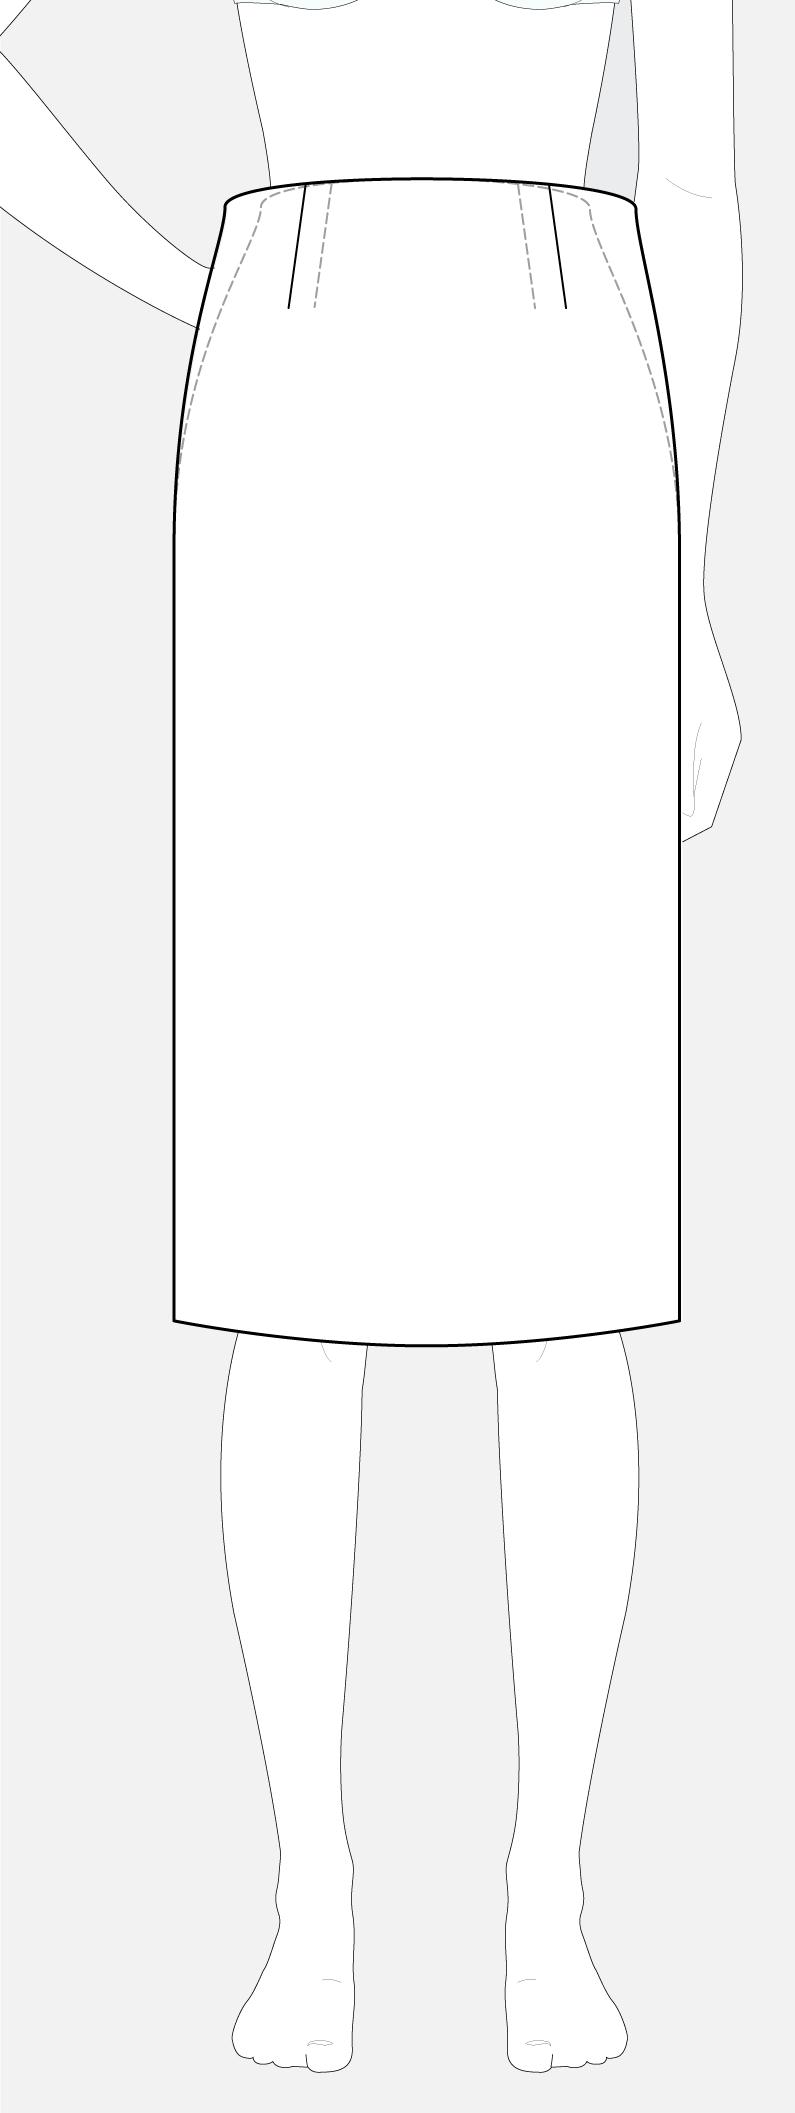 ill-fitting basic skirt block - Patternlab